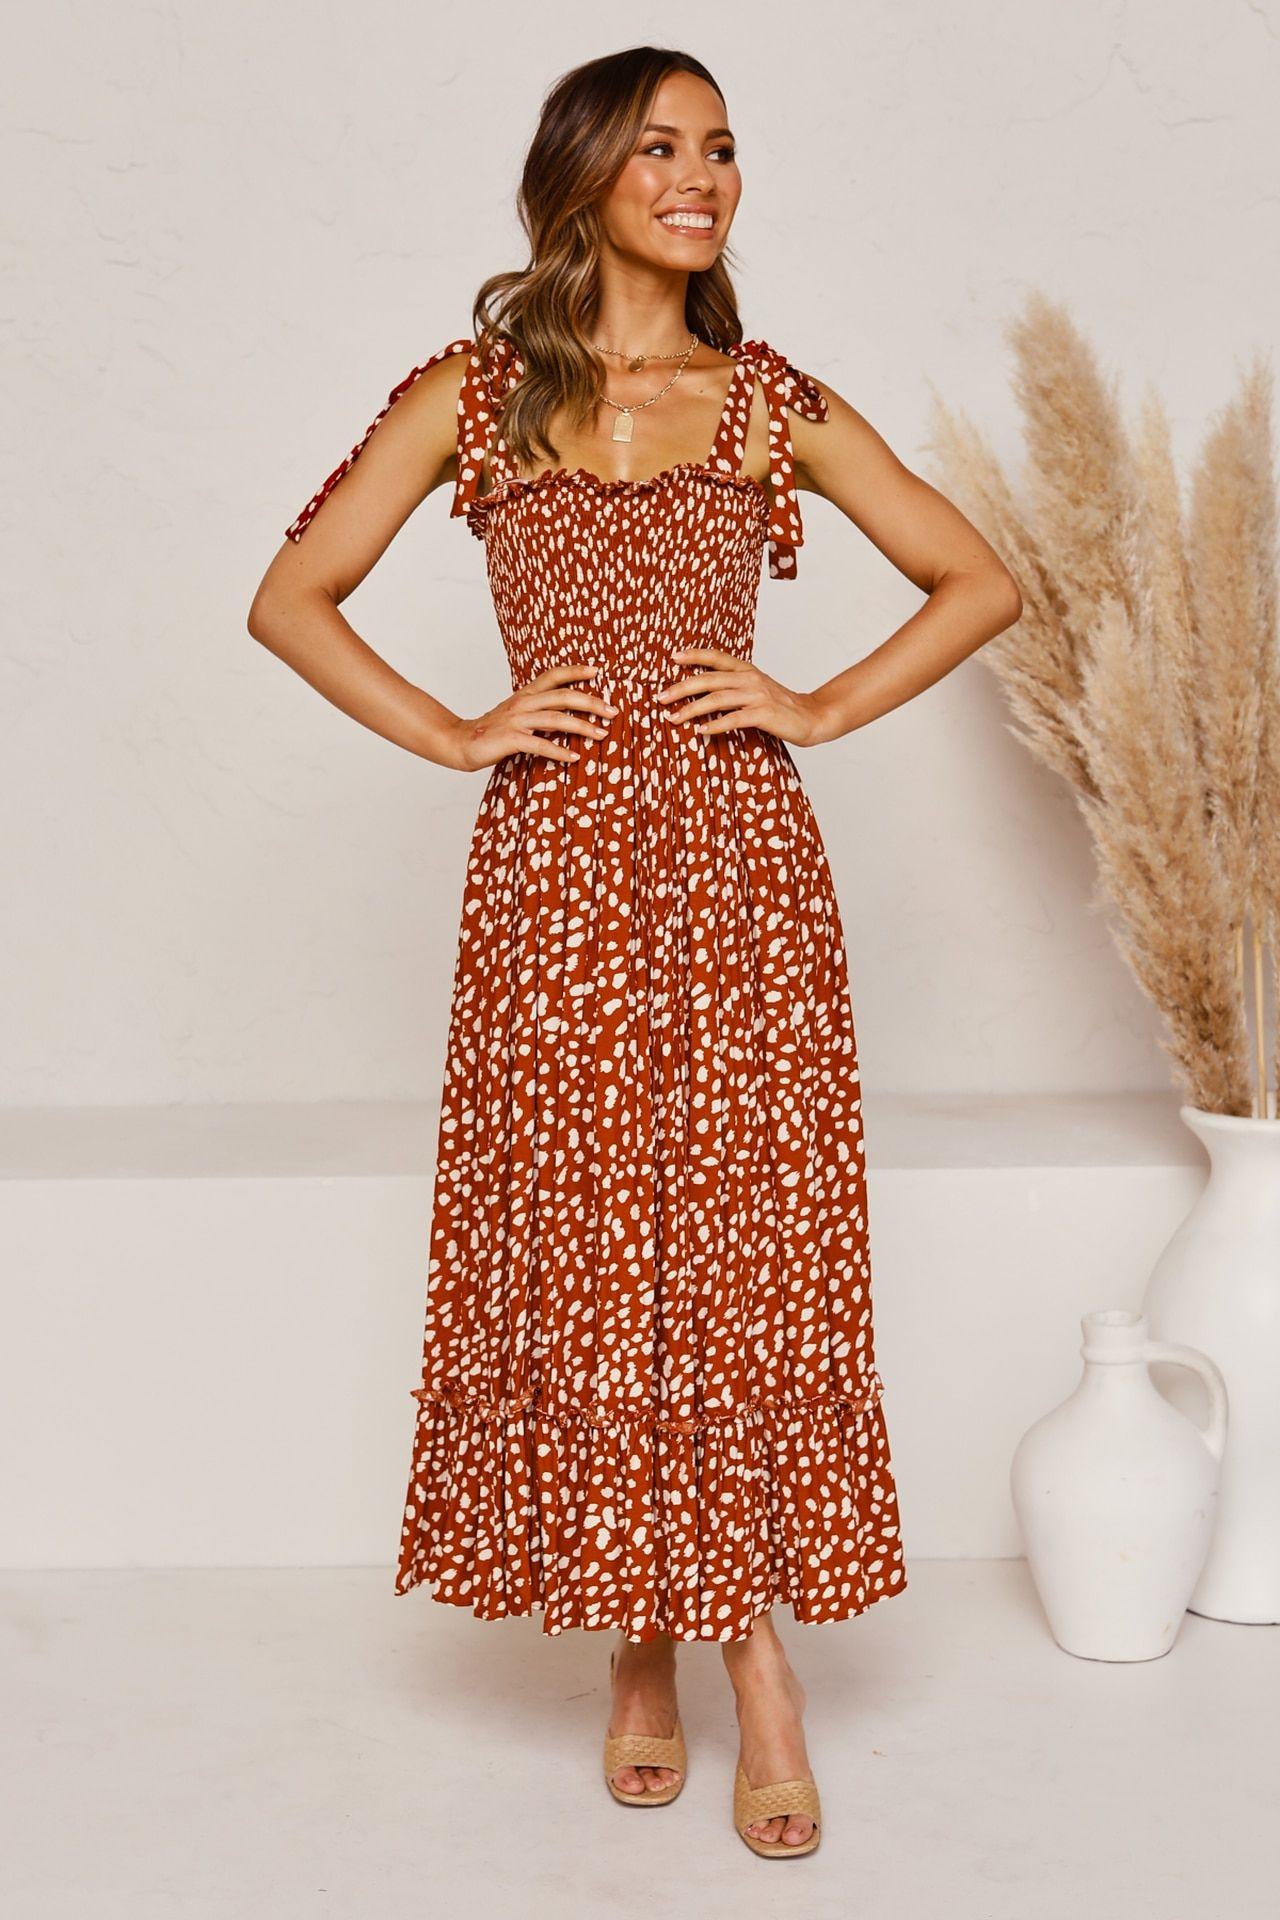 Venus Maxi Dress Rust Summer Dresses Strappy Summer Dresses Maxi Dress [ 1920 x 1280 Pixel ]